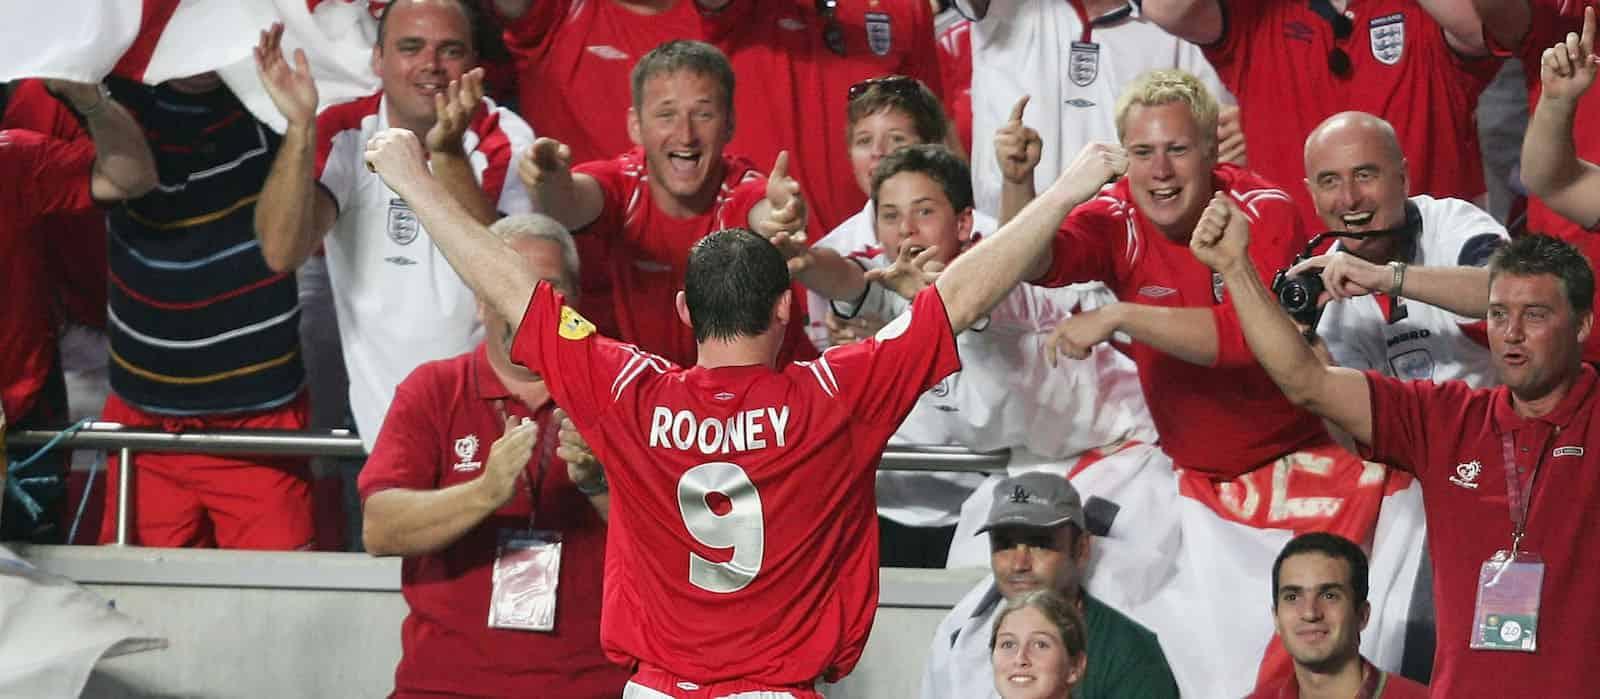 WAYNE-ROONEY-EURO-2004-min